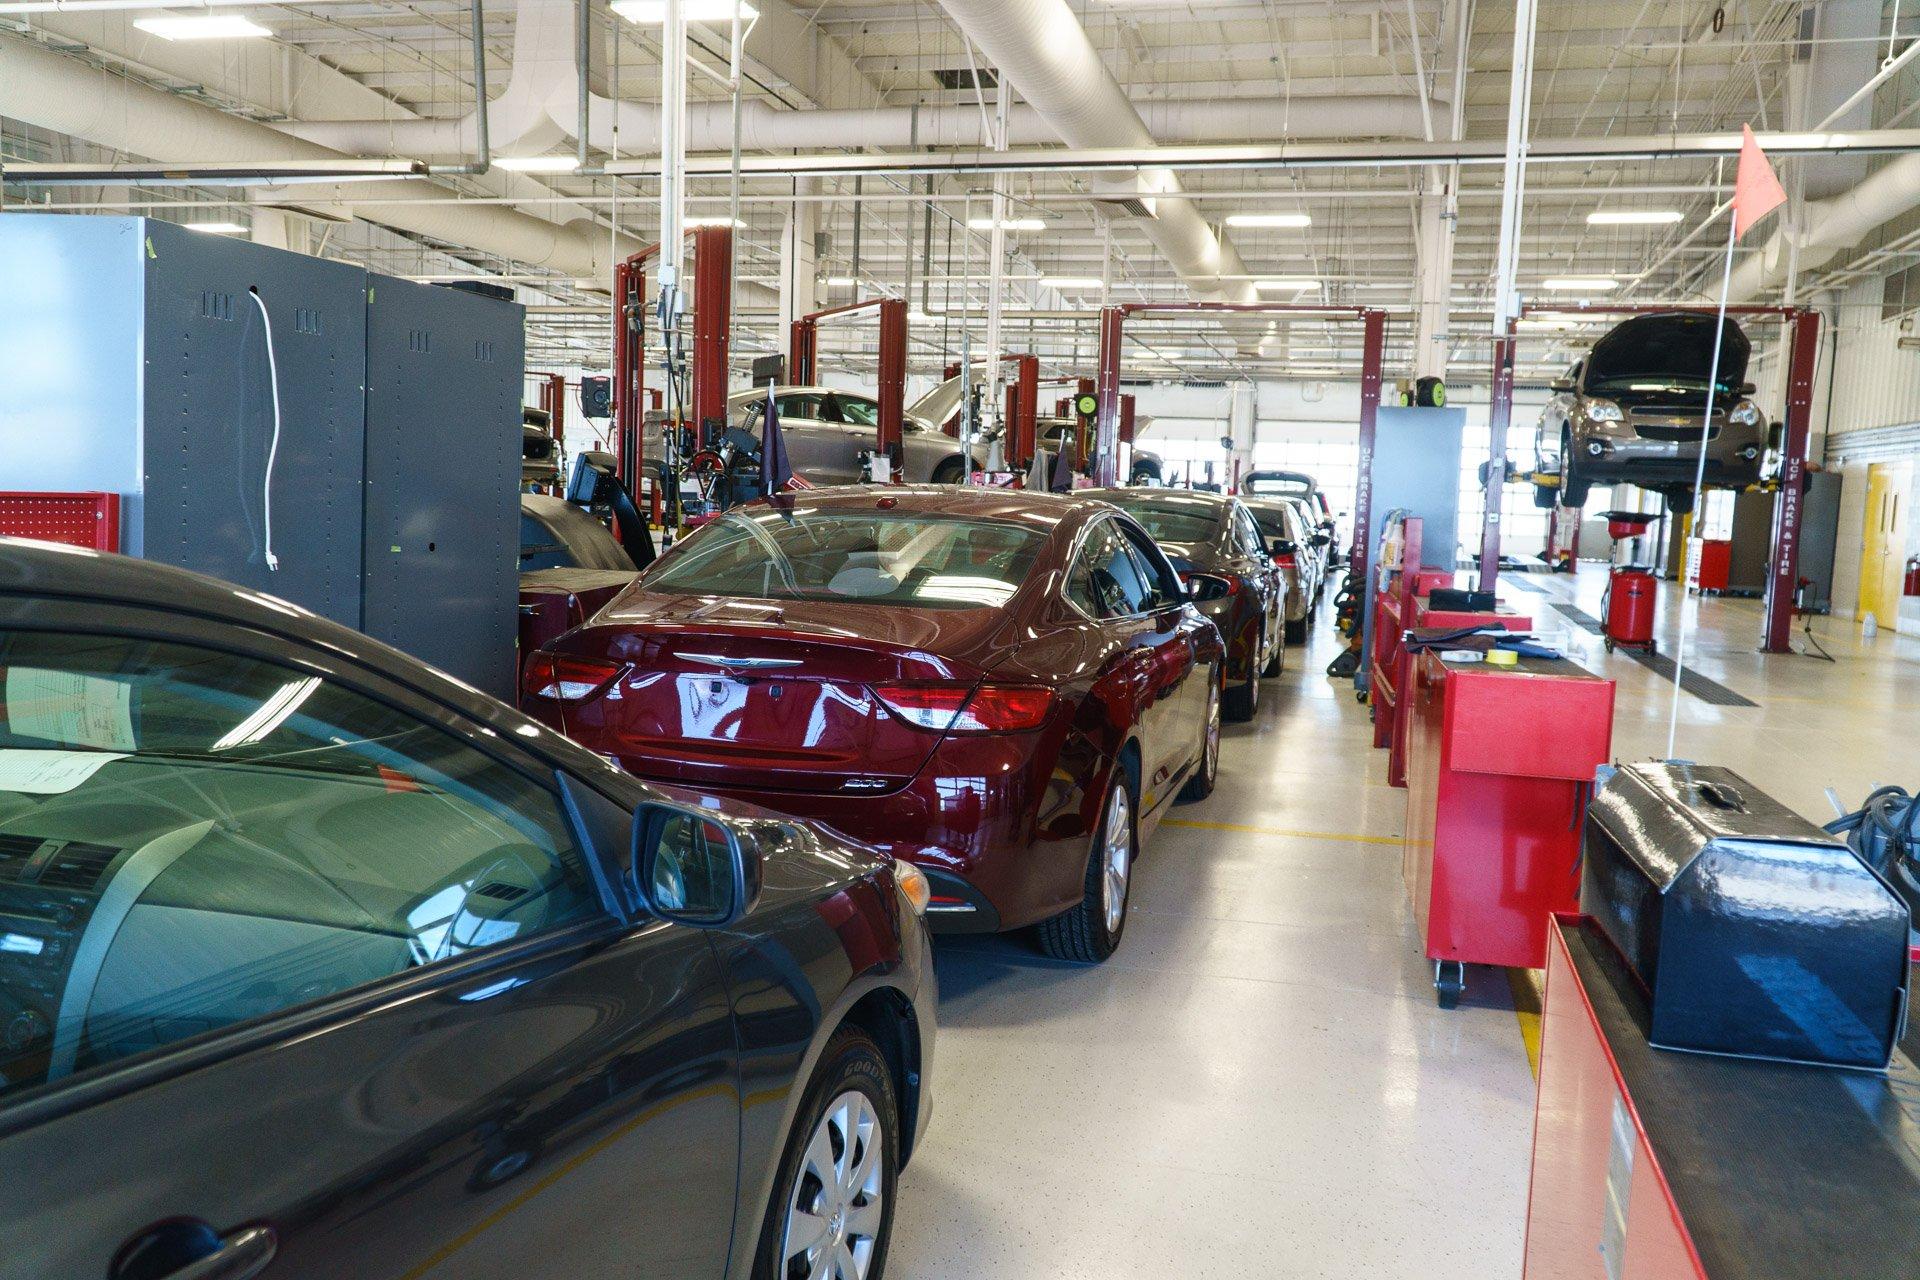 Manheim Car Auction: Inside A Wholesale Car Auction At Manheim Chicagoland